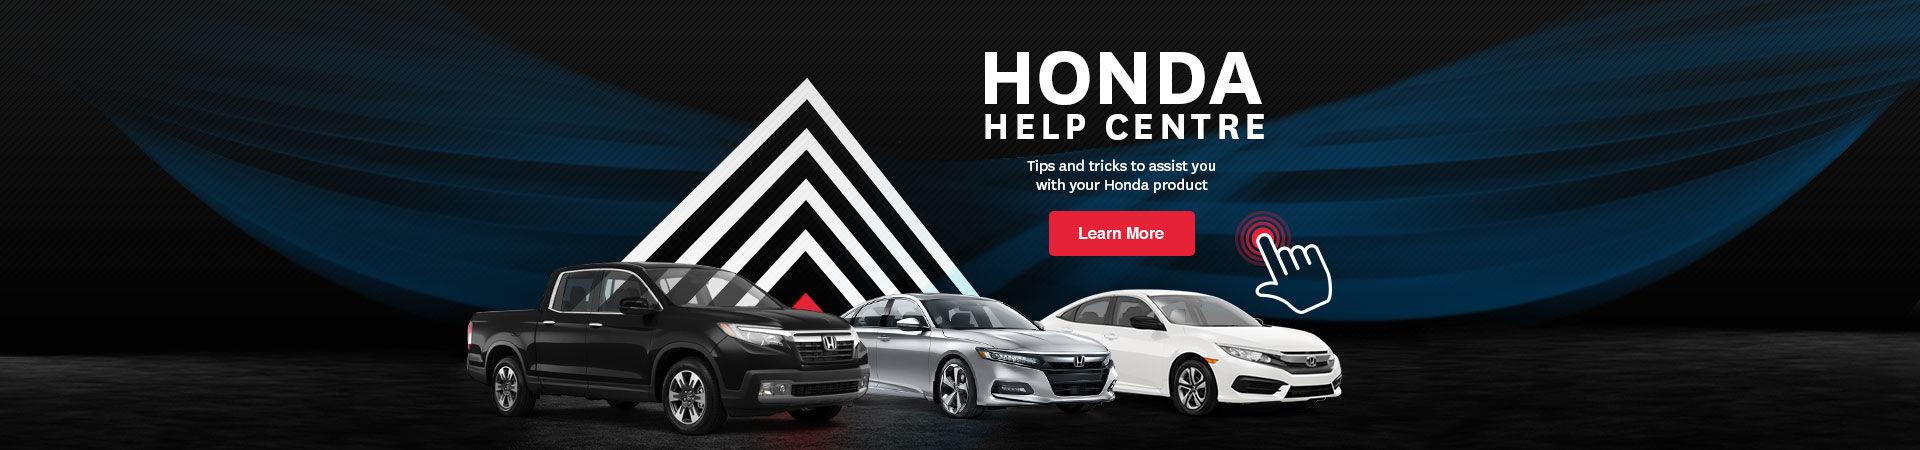 Honda Help Center